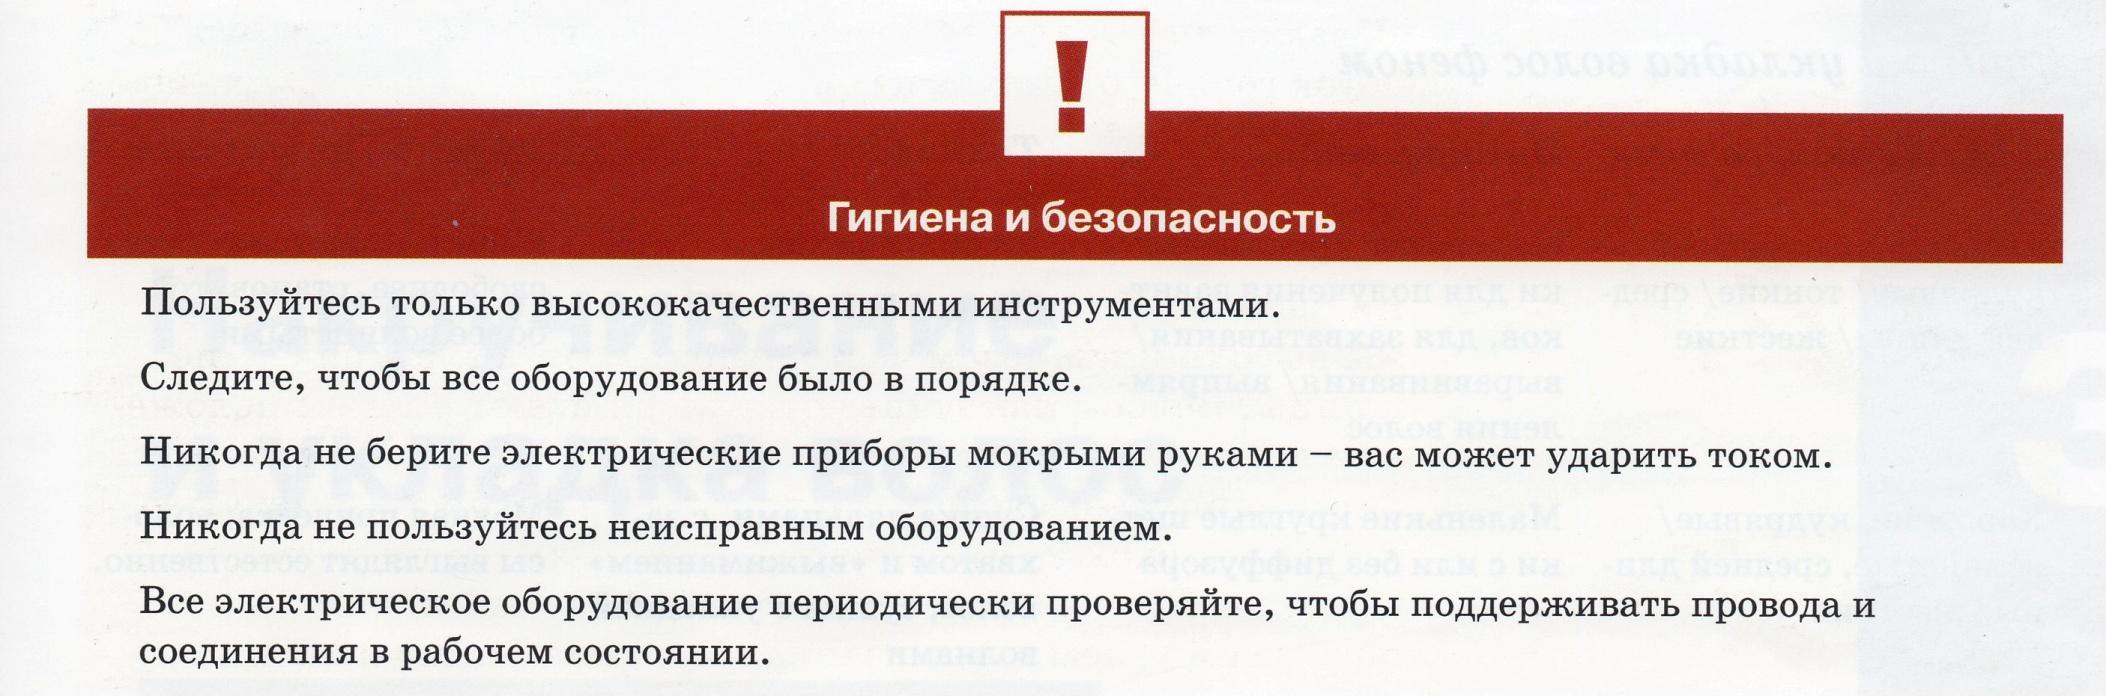 H:\открытый урок\ТБ горячим способом\img023.jpg